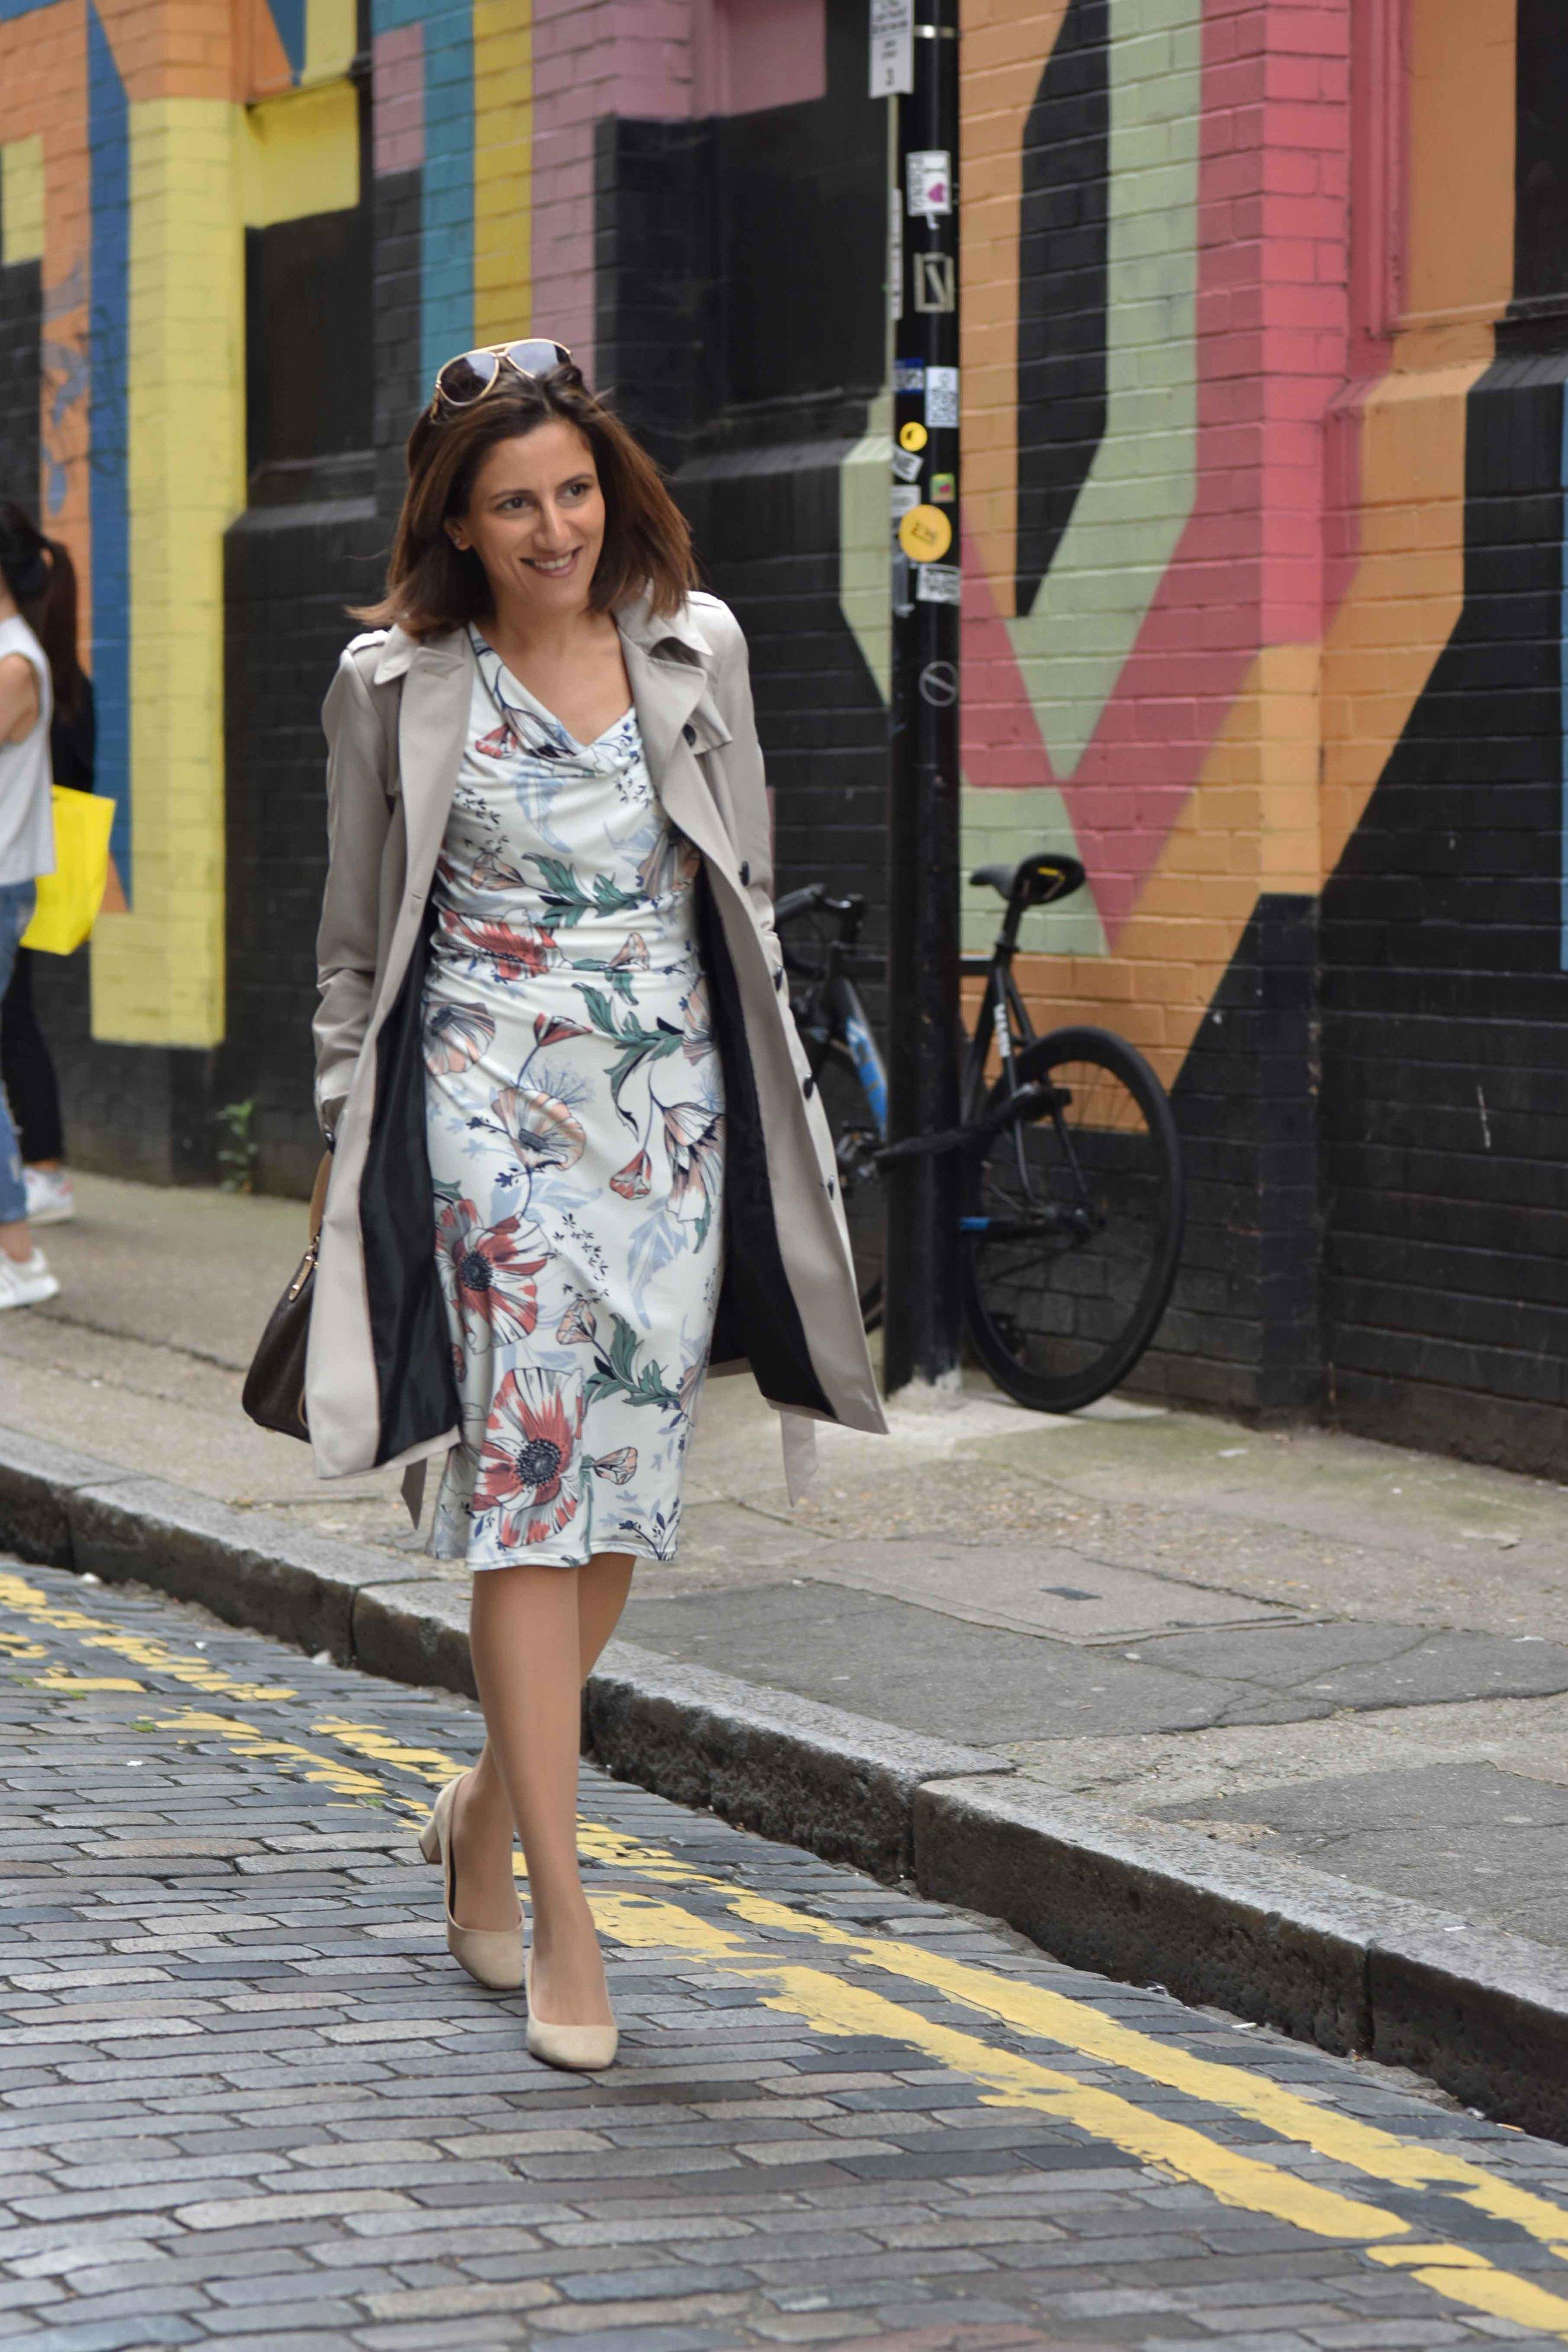 Marks and Spencer shift dress, Marks and Spencer trench, Zara sandals, Gucci sunglasses, street fashion, street art, Shoreditch, London, U.K. Photo: Nina Shaw, Image©sourcingstyle.com